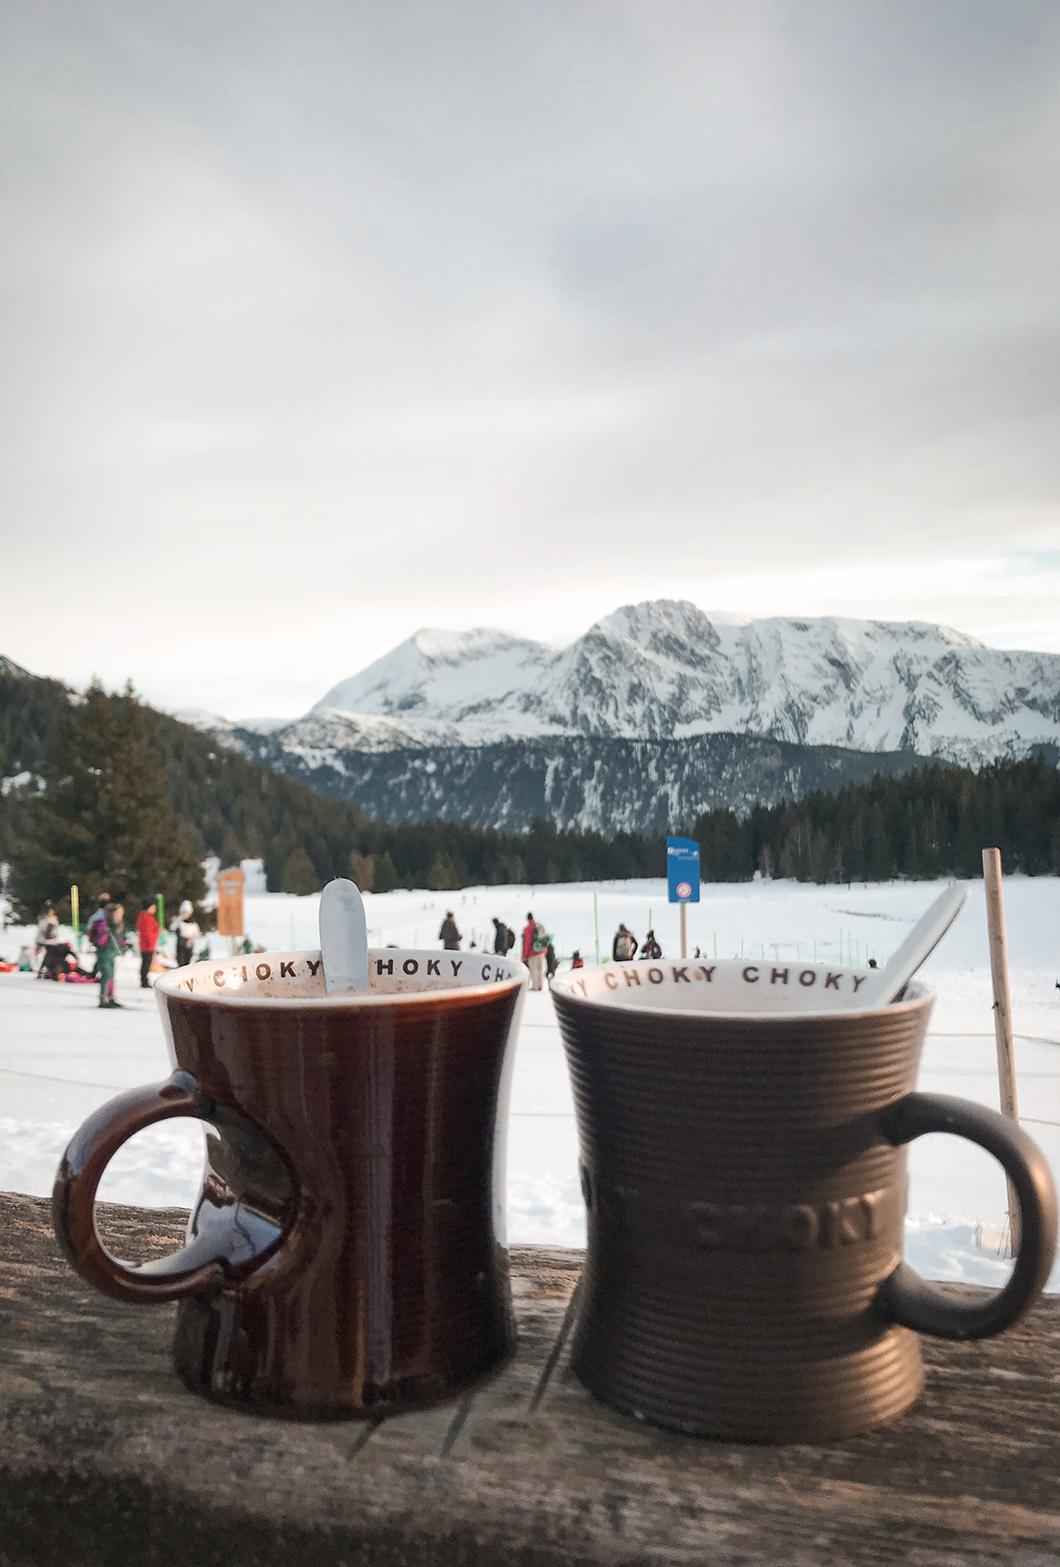 Chocolat chaud à la Chartreuse - Chamrousse - Alpes